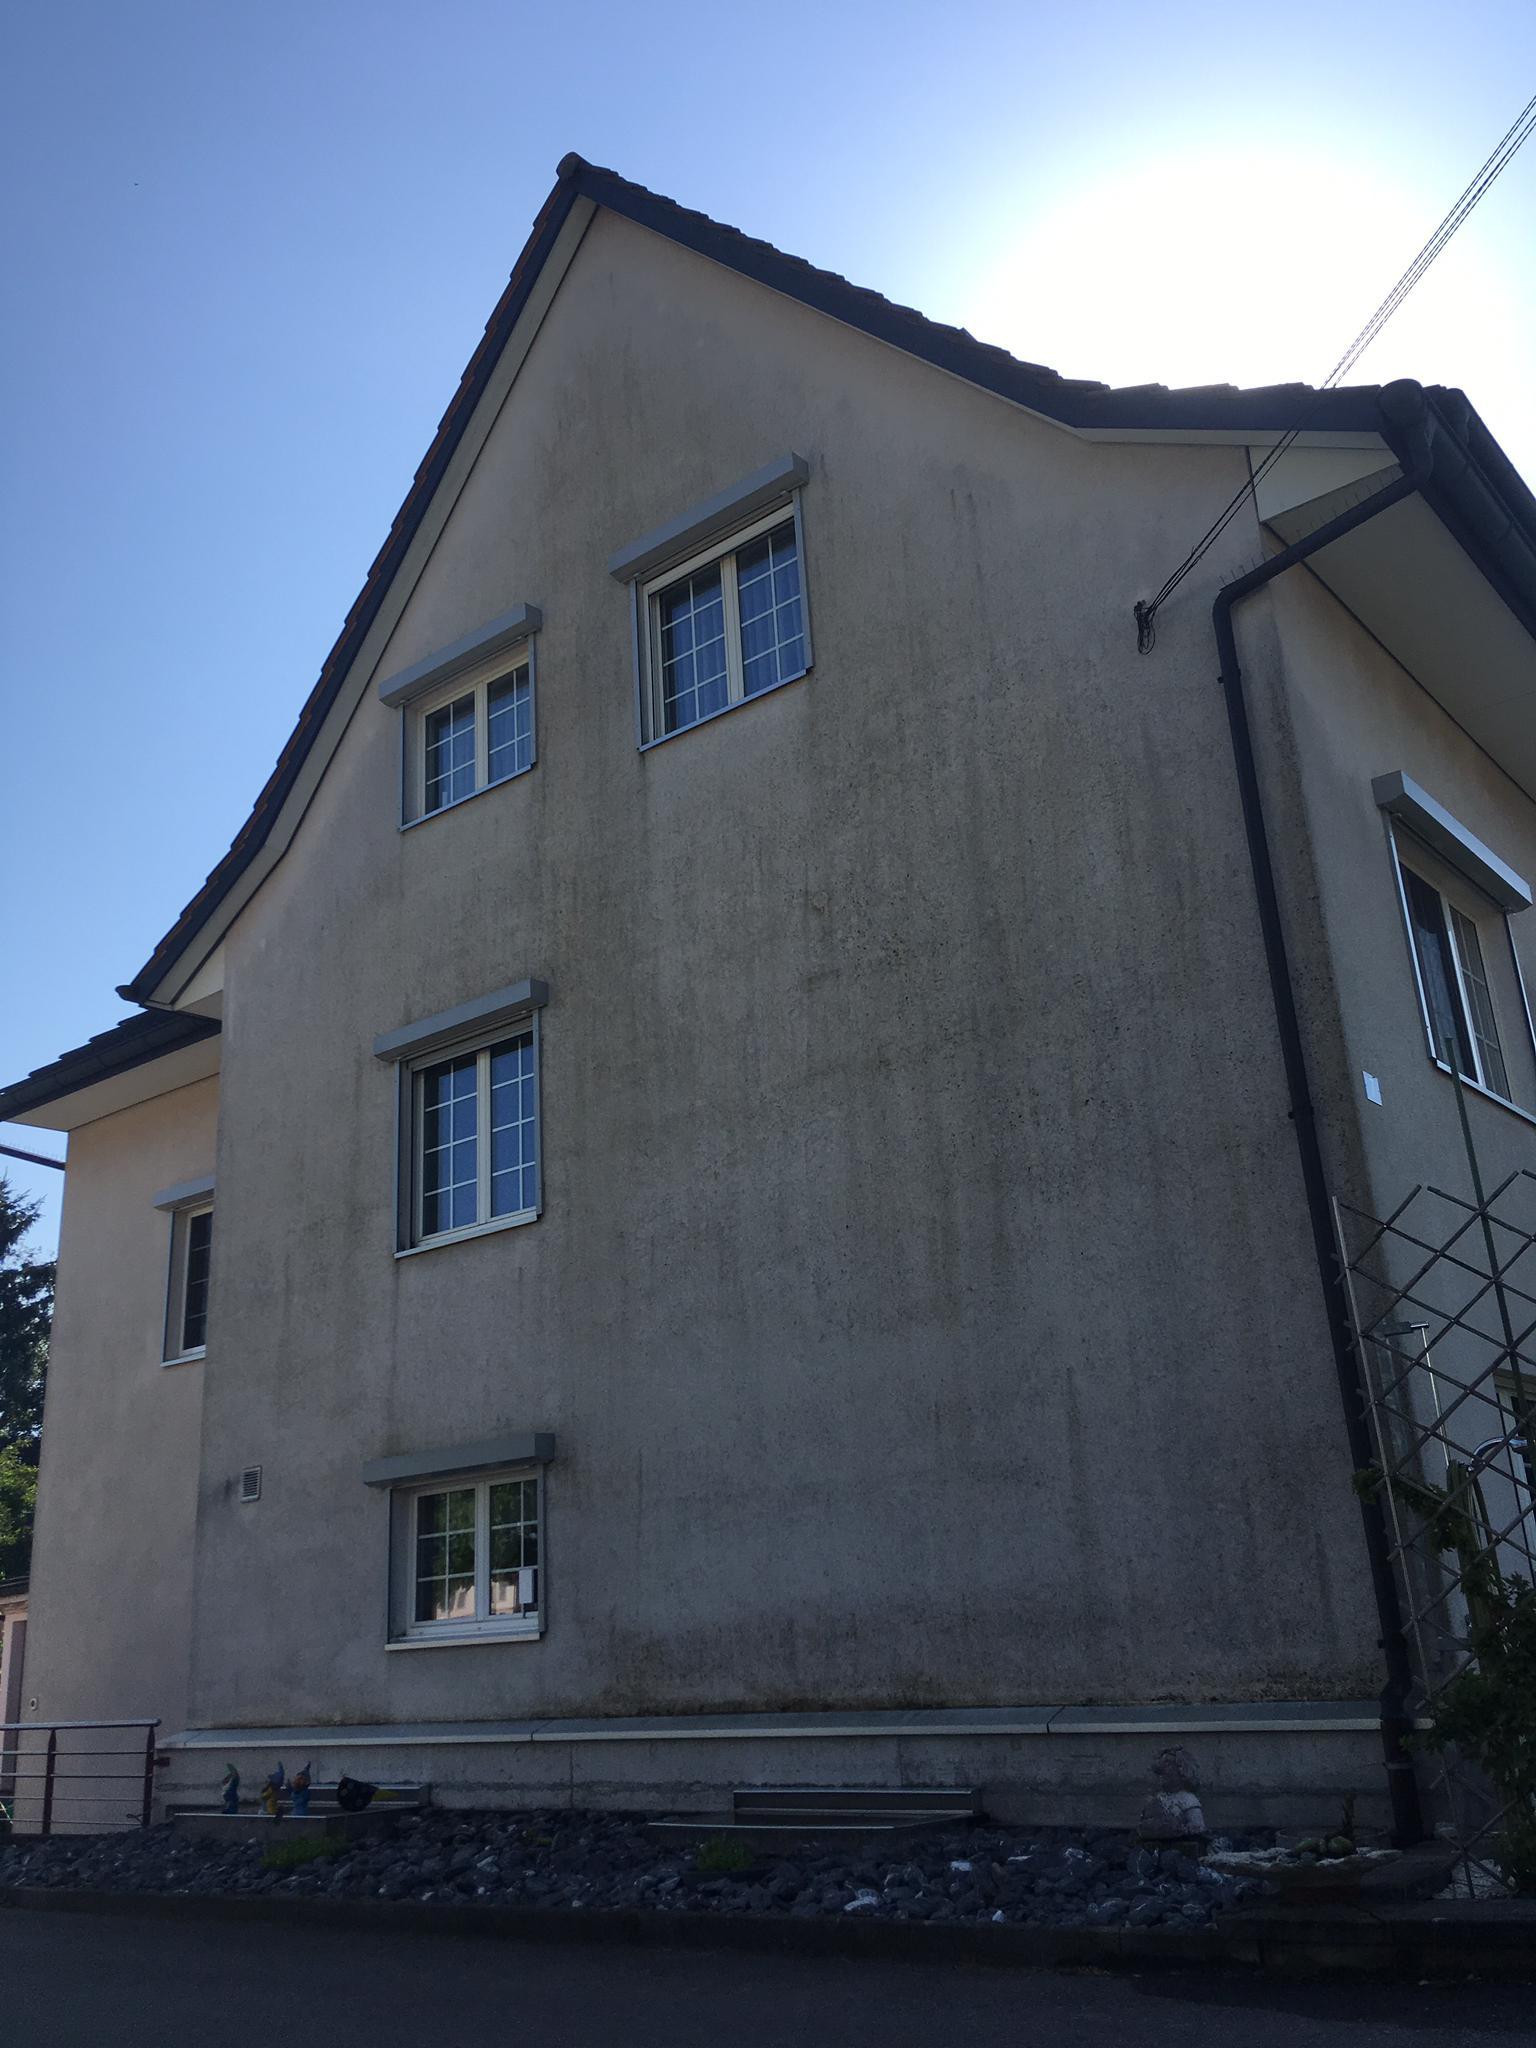 https://www.koster-gs.ch/wp-content/uploads/2021/02/Hengartner-Fassade-1-vorher.jpg